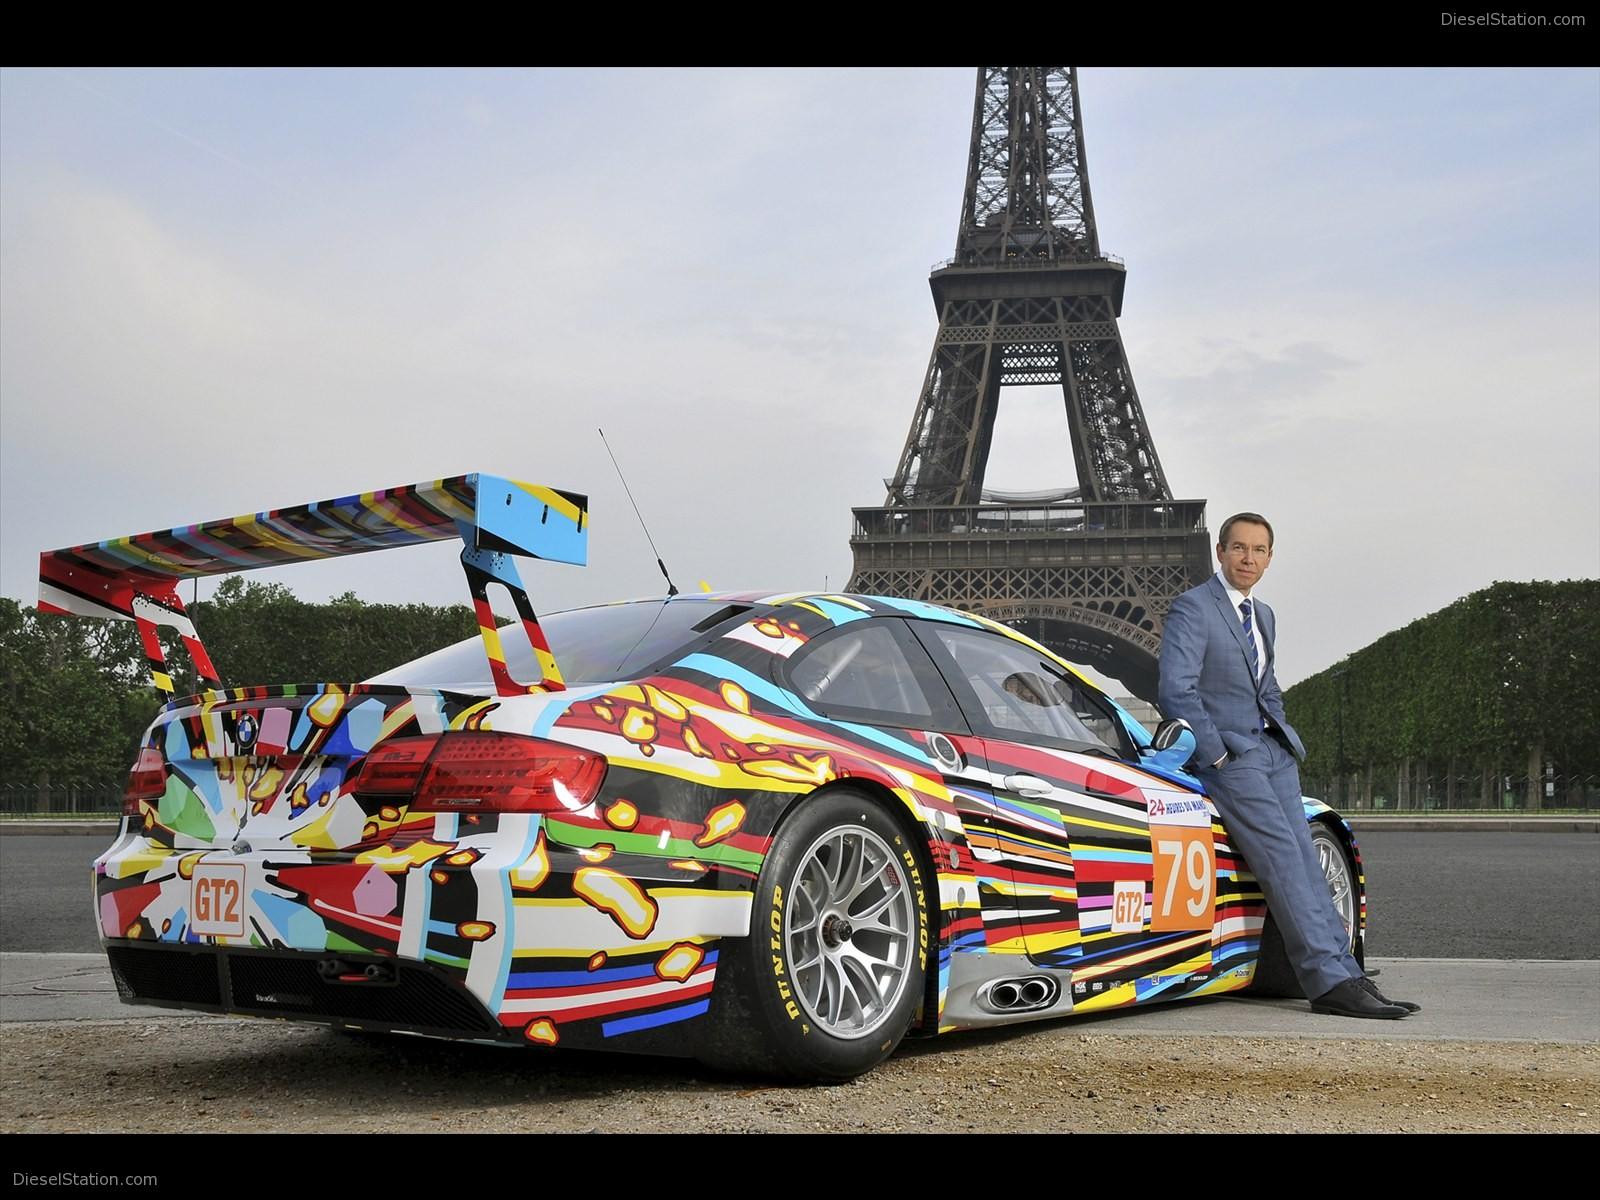 bmw-m3-gt2-art-car-jeff-koons-2011-09